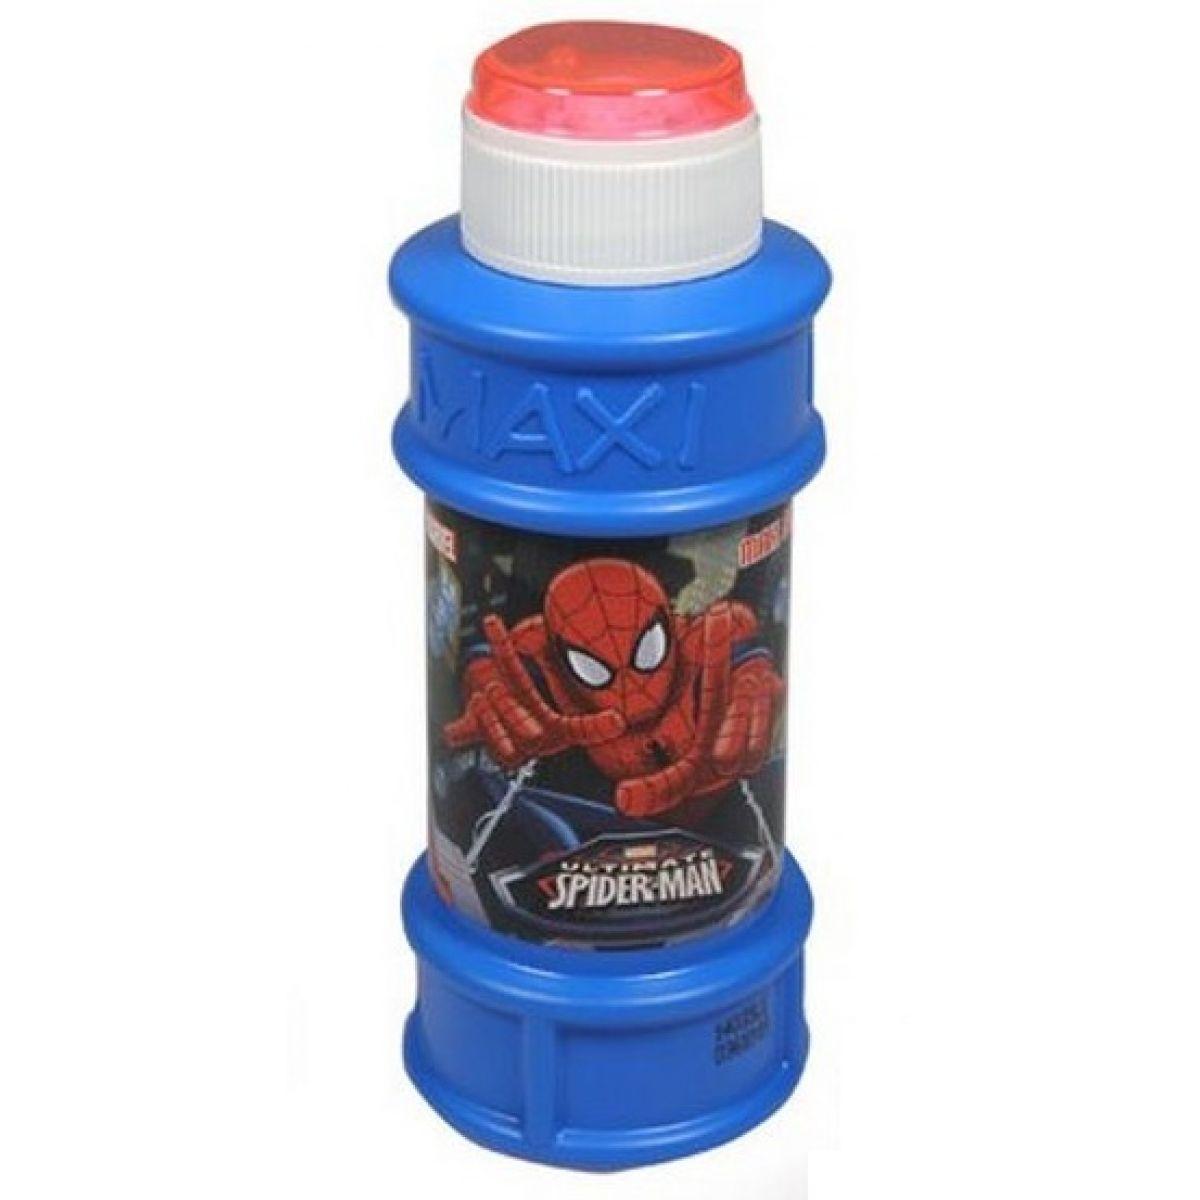 Bublifuk Spiderman 175 ml - Poškozený obal